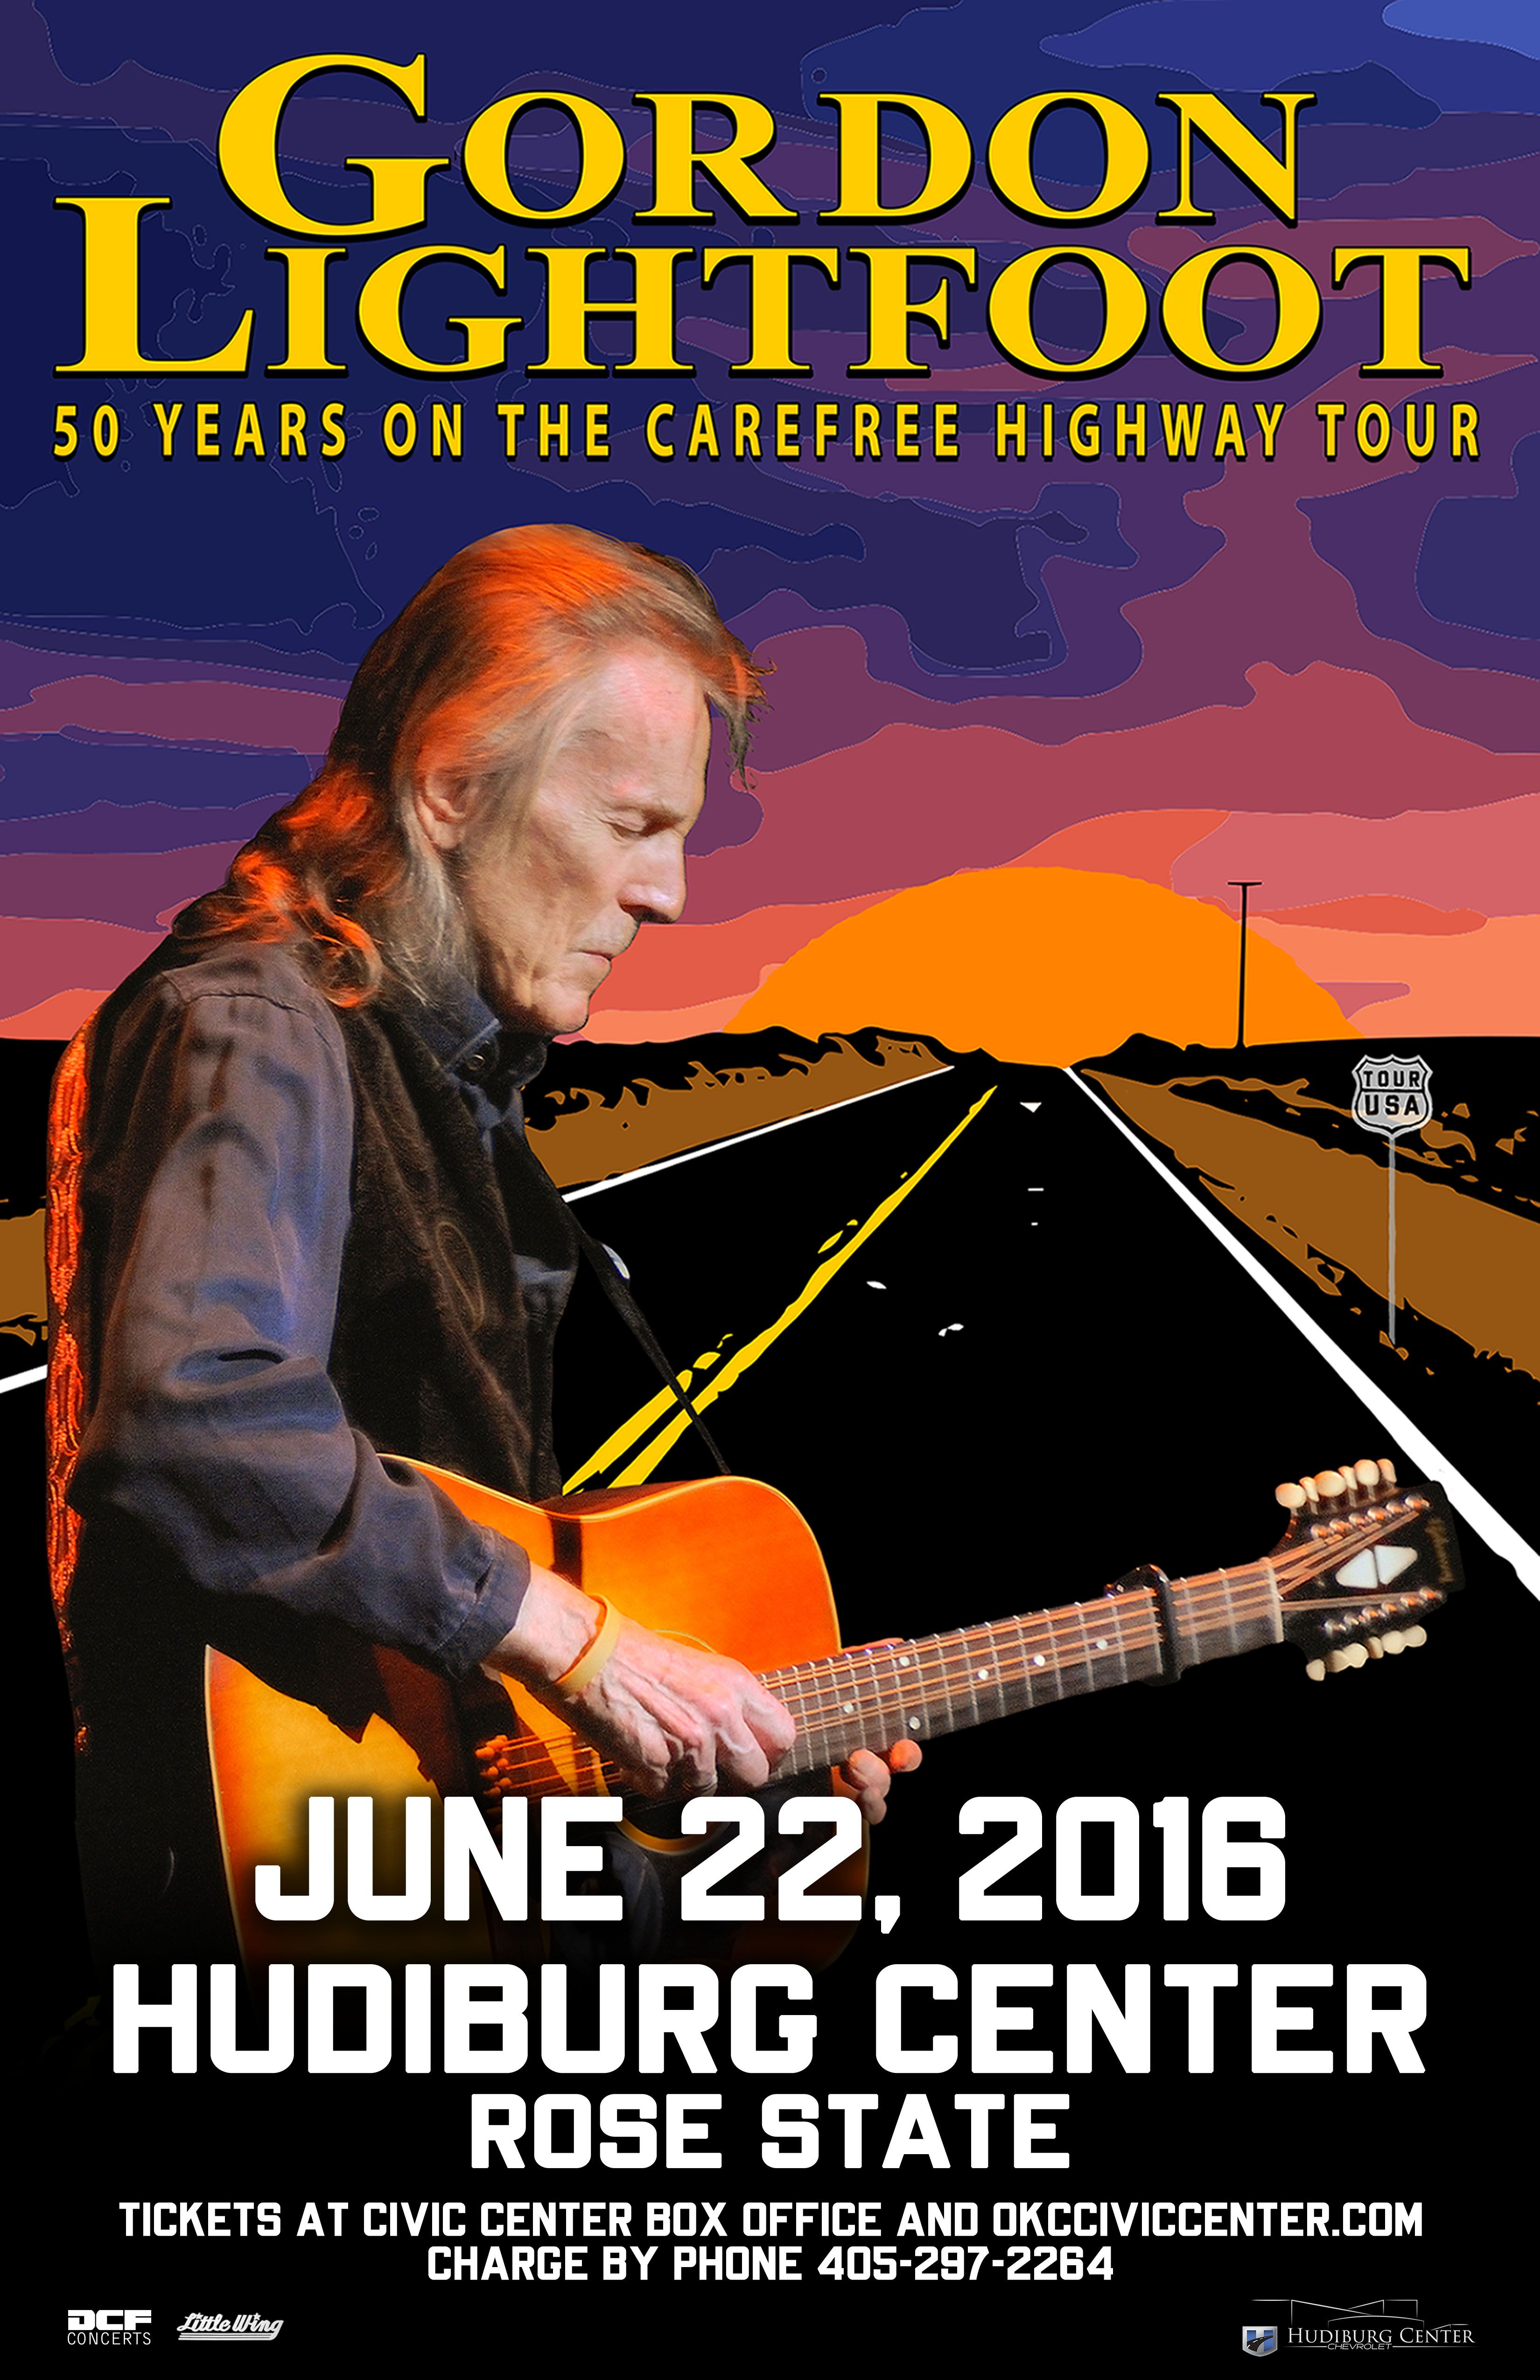 GORDON LIGHTFOOT Wed   Jun 22 Rose State College Hudiburg Chevrolet Center  6000 Trosper Rd. Midwest City, OK Tickets On Sale Now Civic Center Box  Office ...